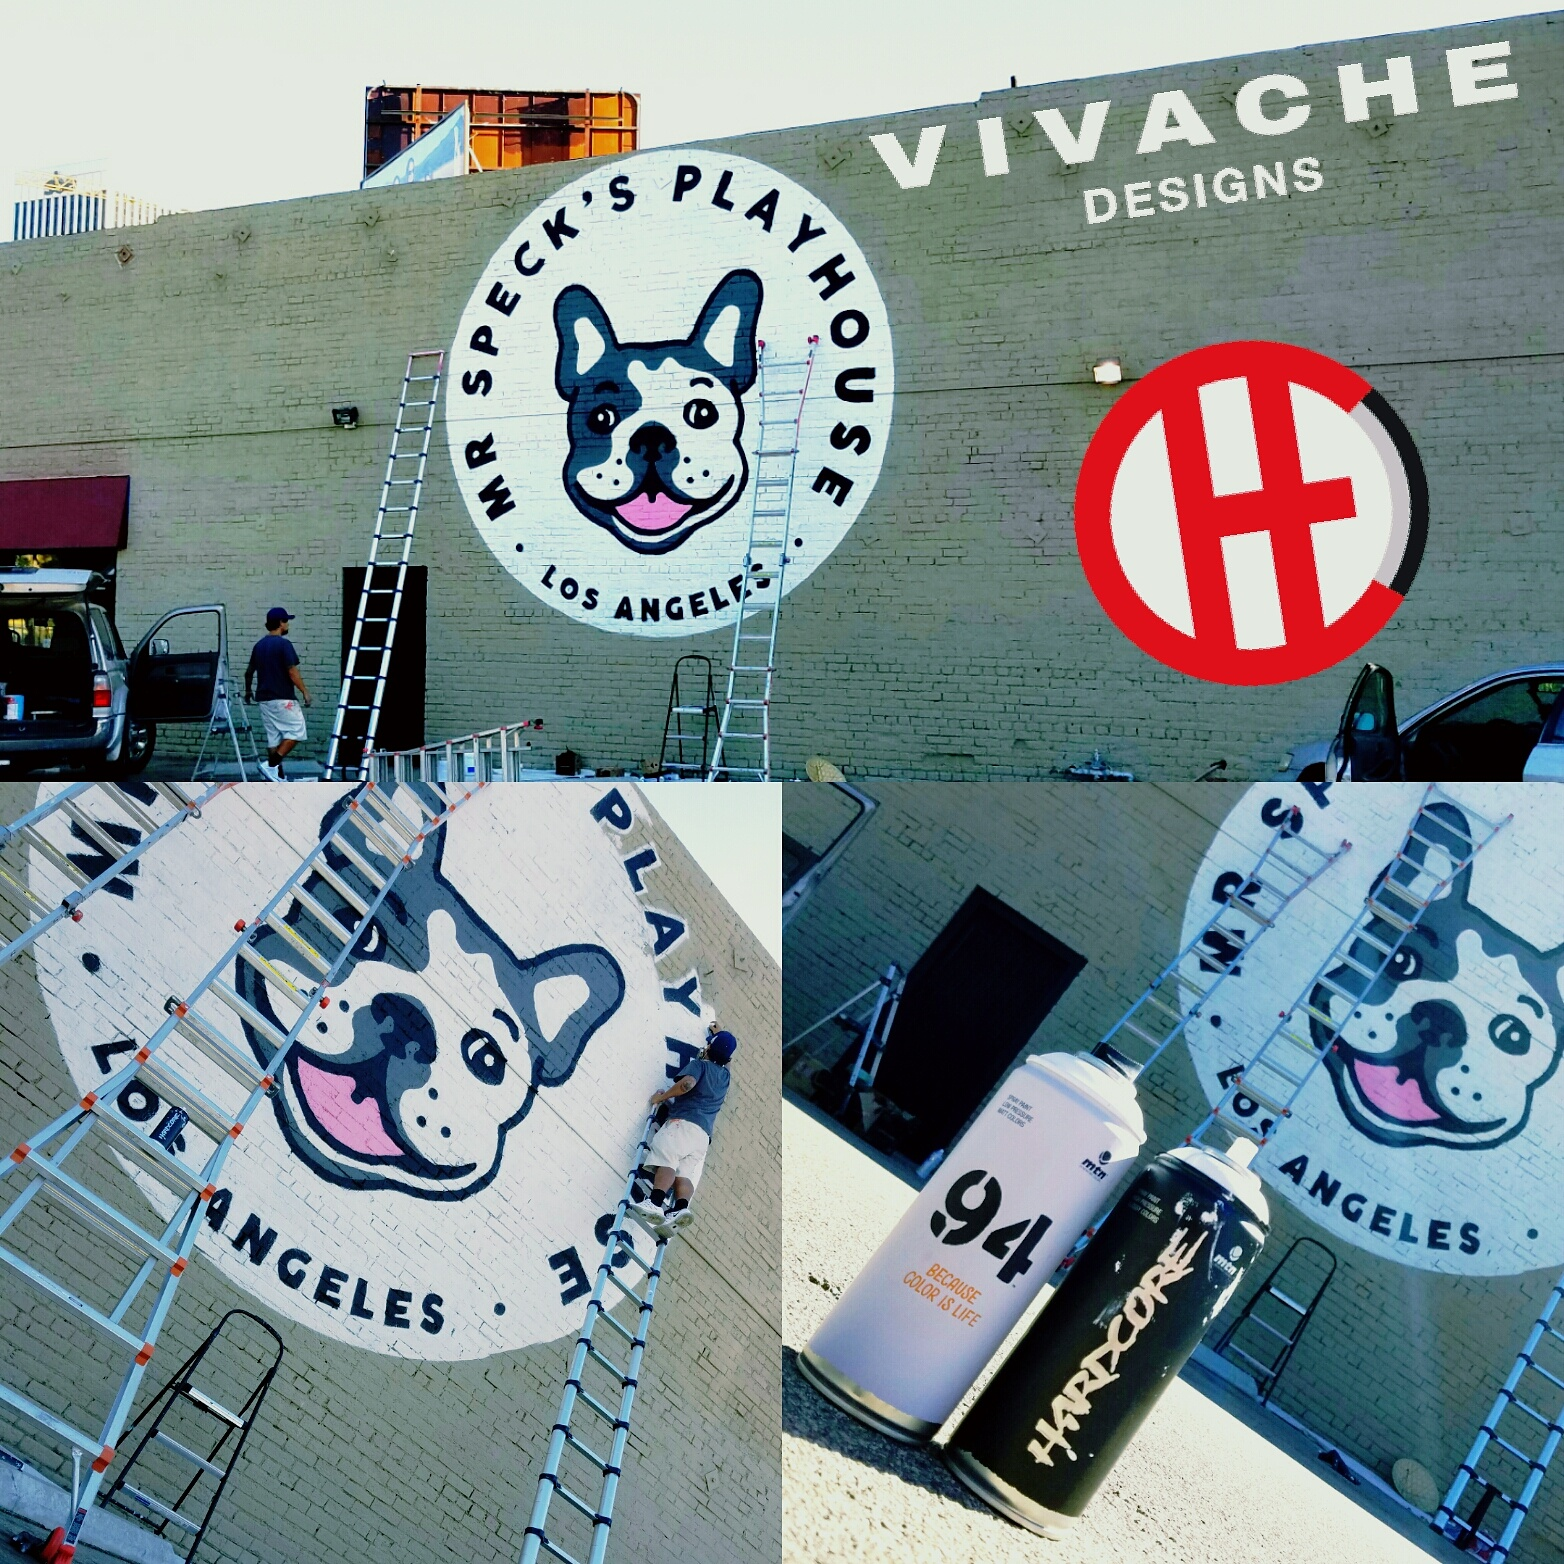 Vivache Designs Wall Mural Hollywood.jpg